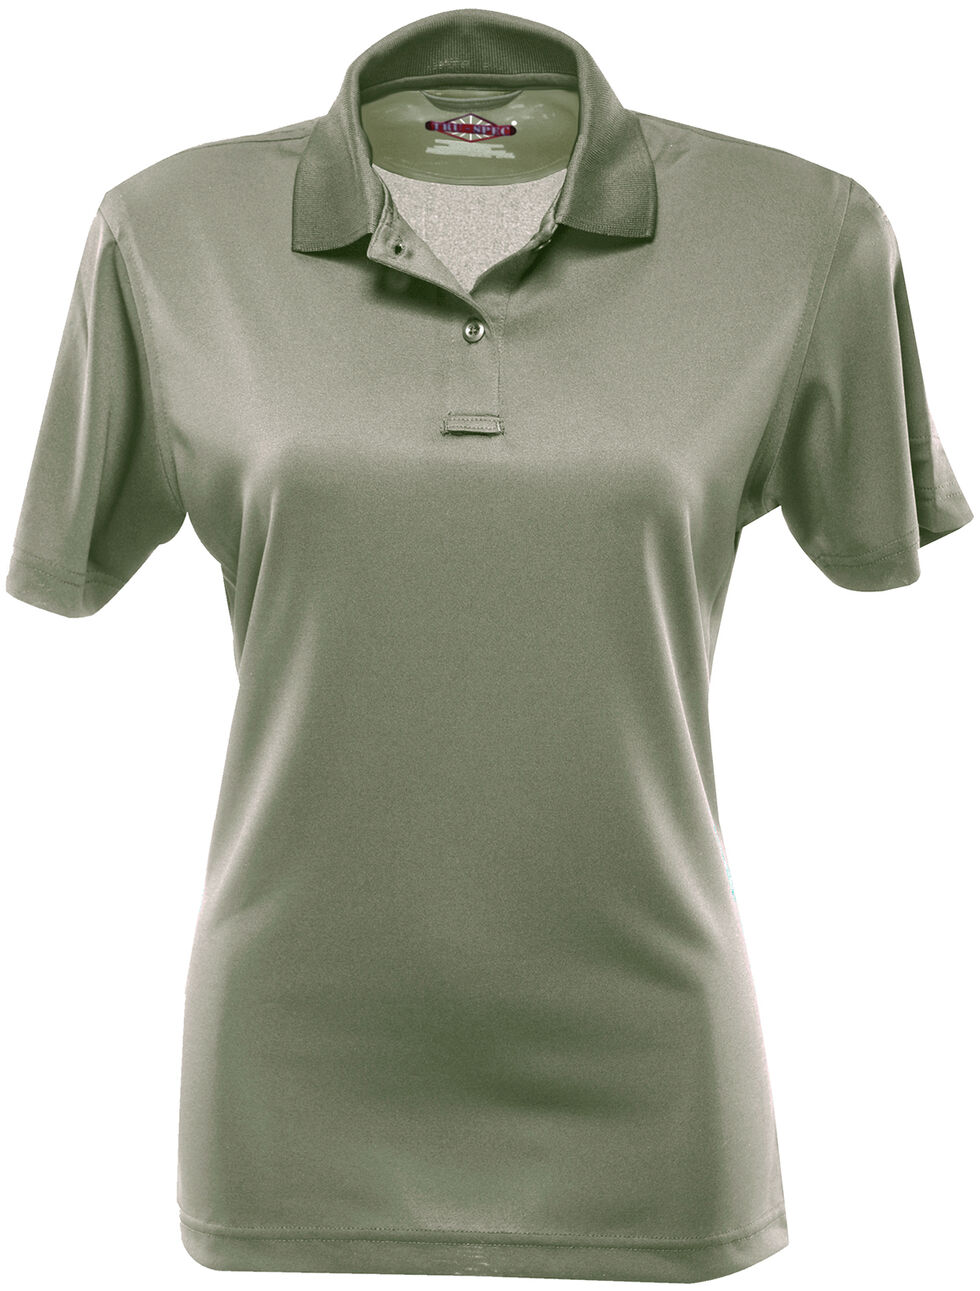 Tru-Spec Women's 24-7 Series Performance Polo Shirt, Green, hi-res